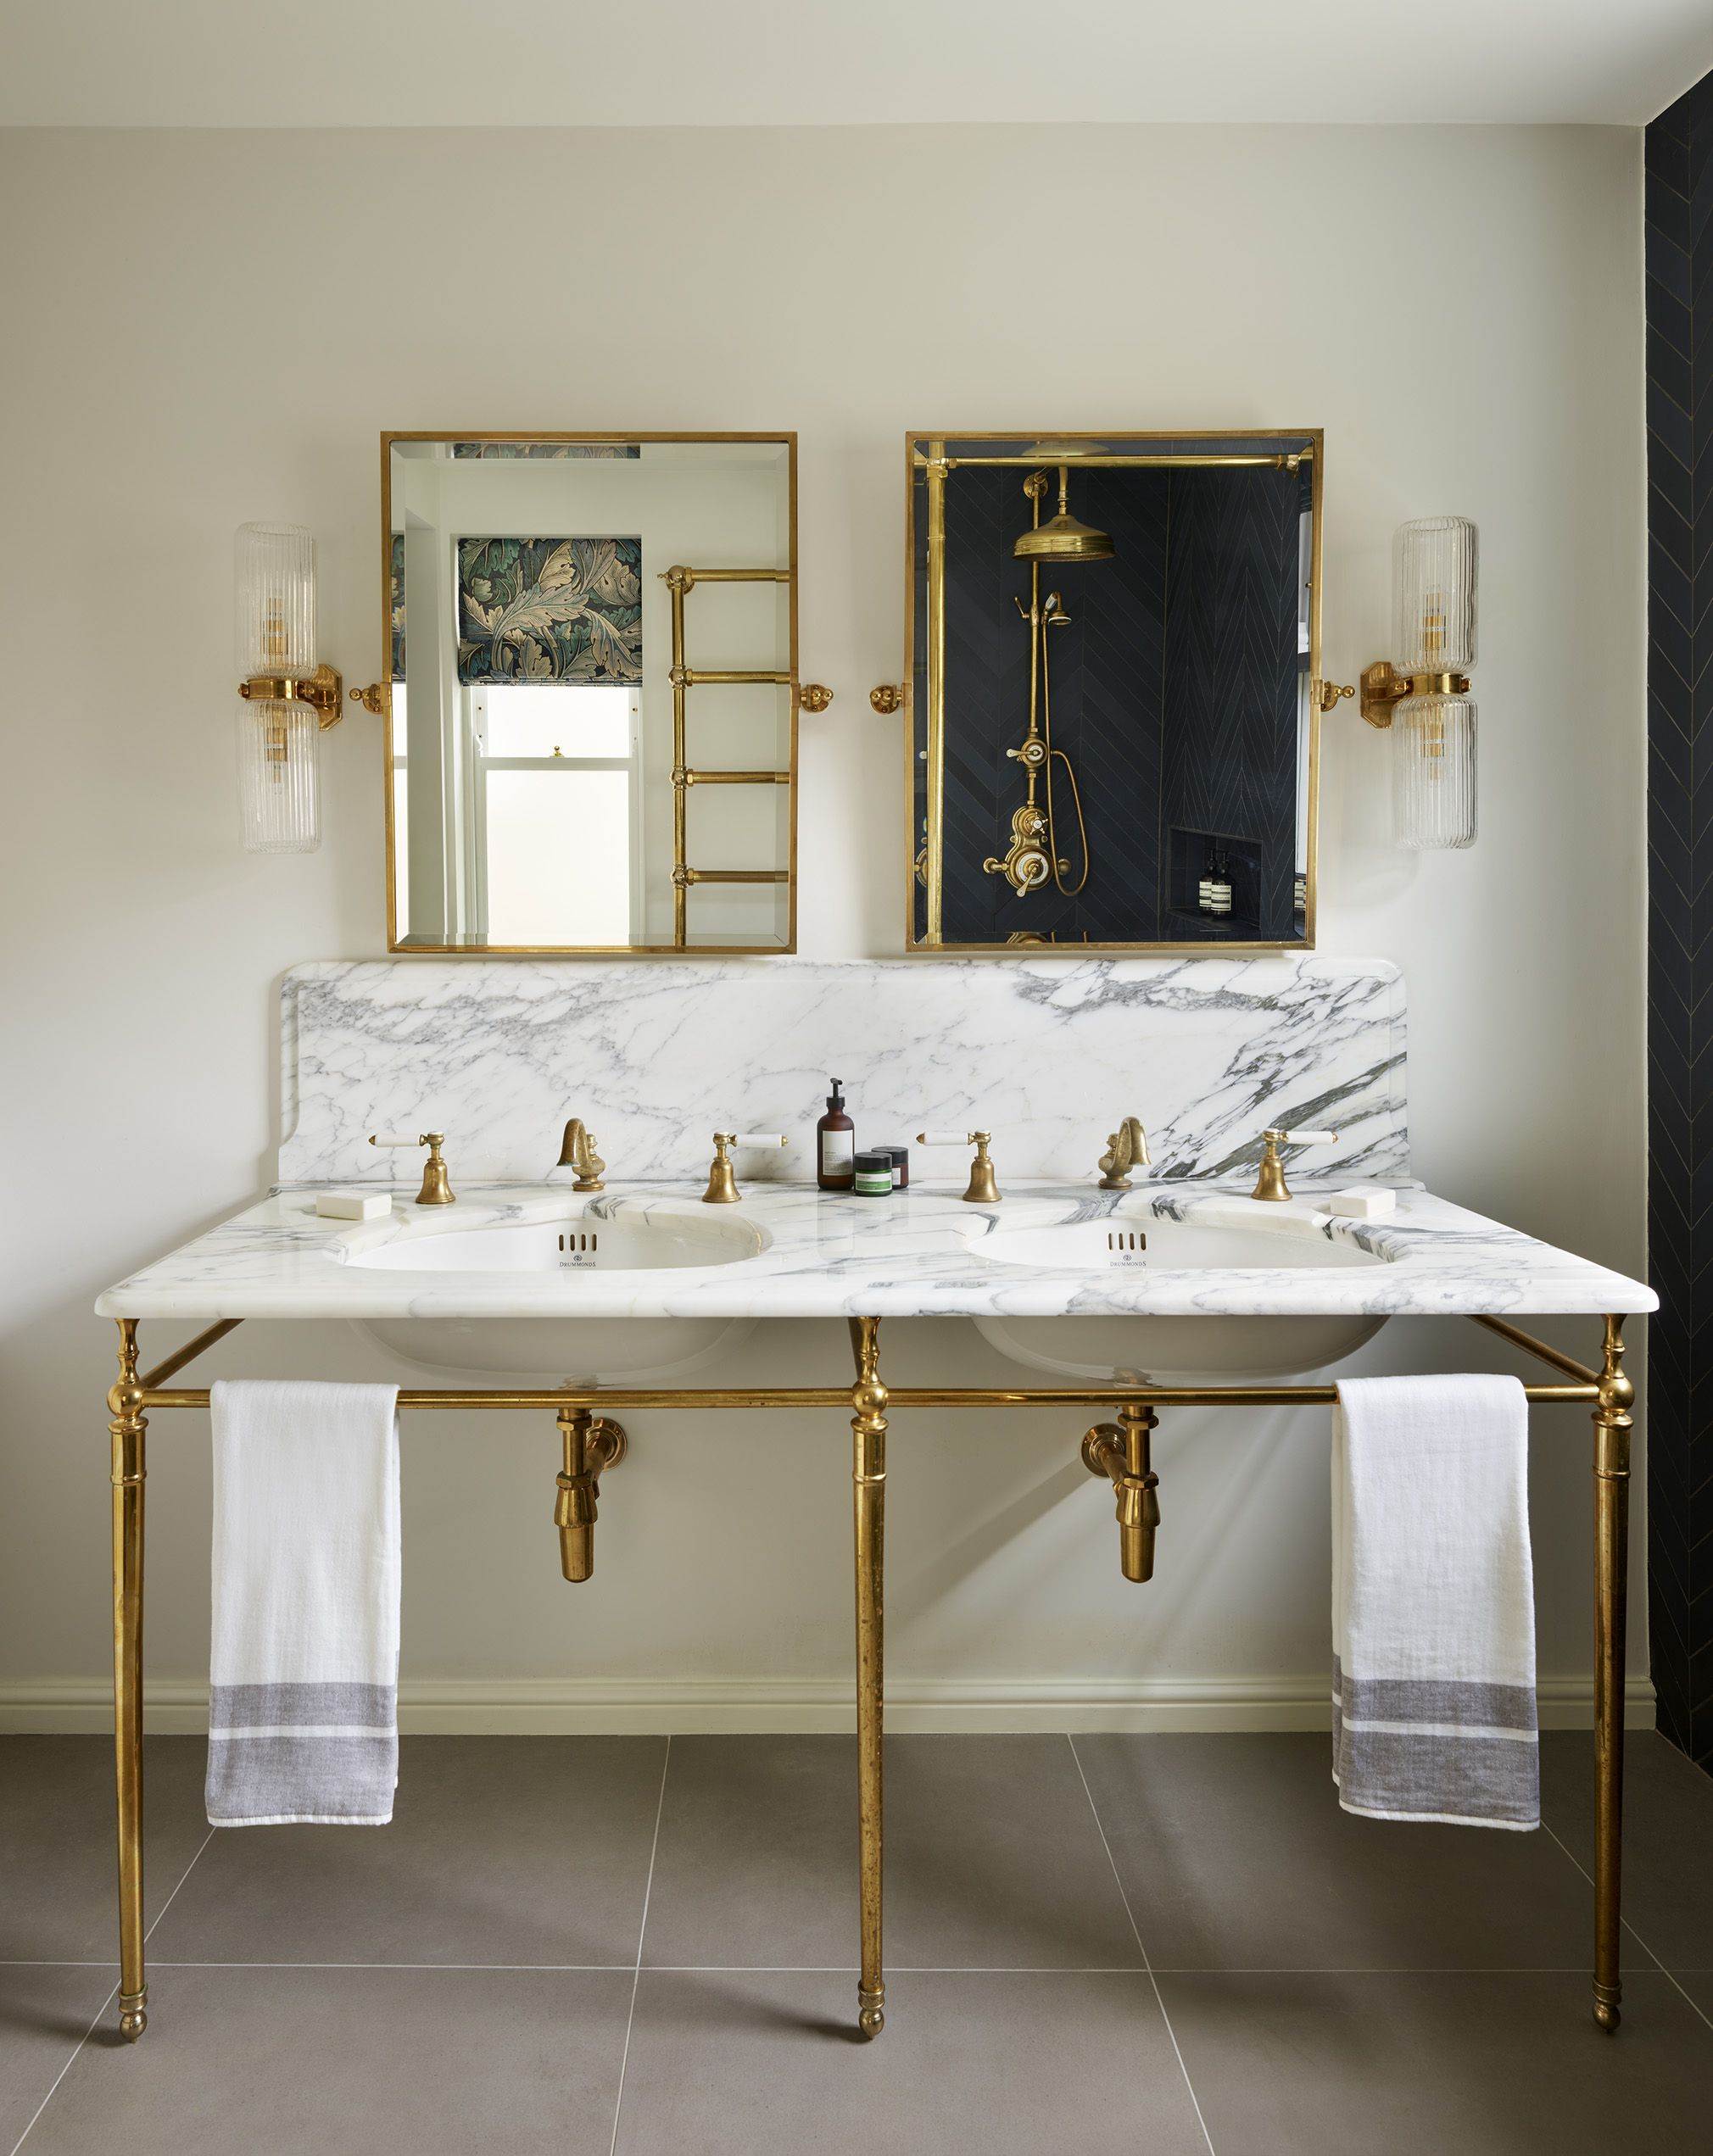 English Bathroom Design Simple Designeddrummonds' Bathroom Design Service This Townhouse Review